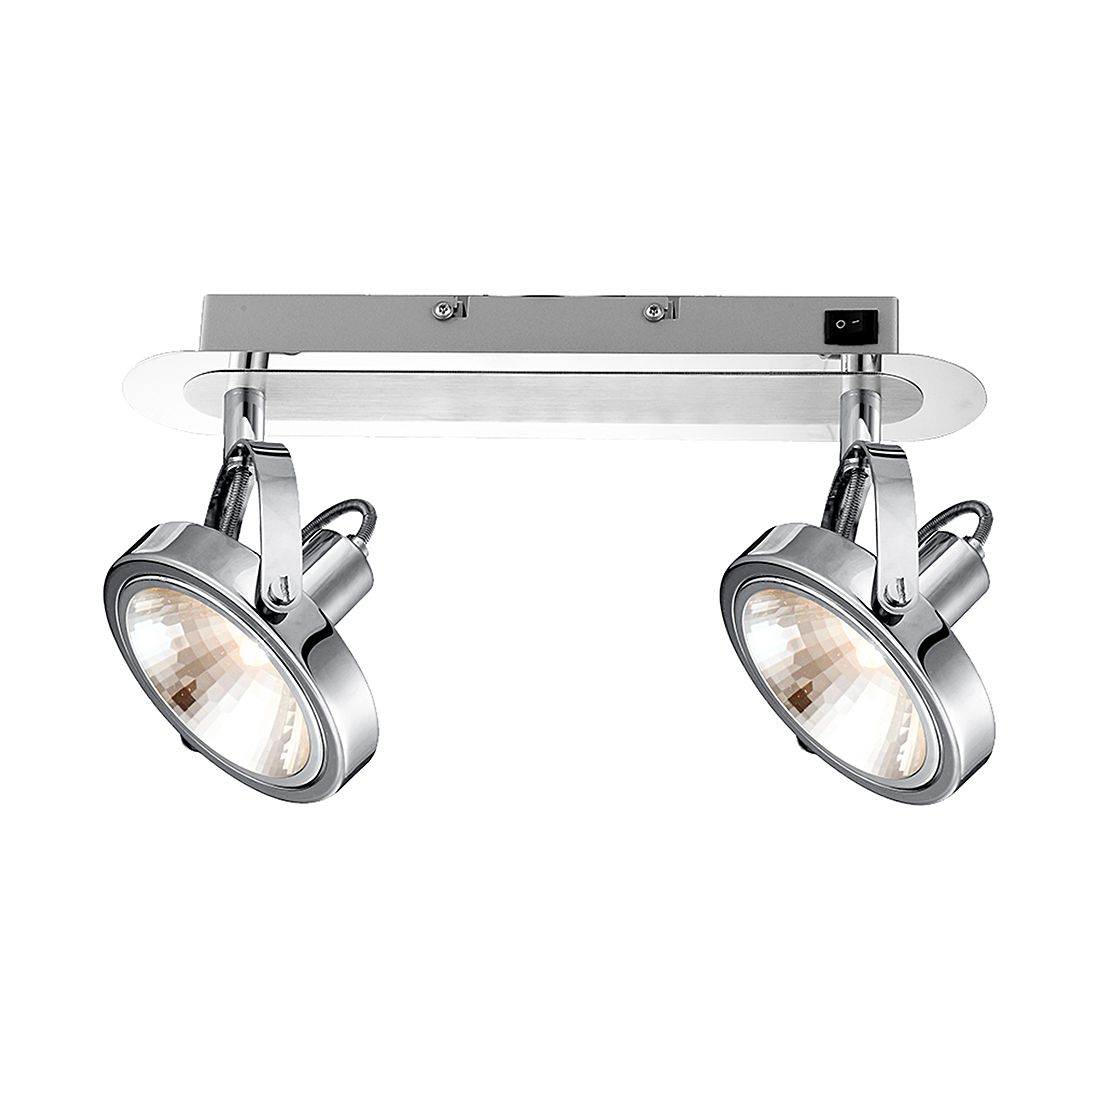 EEK A++, Deckenstrahler KIROGI – Metall – 2-flammig, Globo Lighting günstig online kaufen